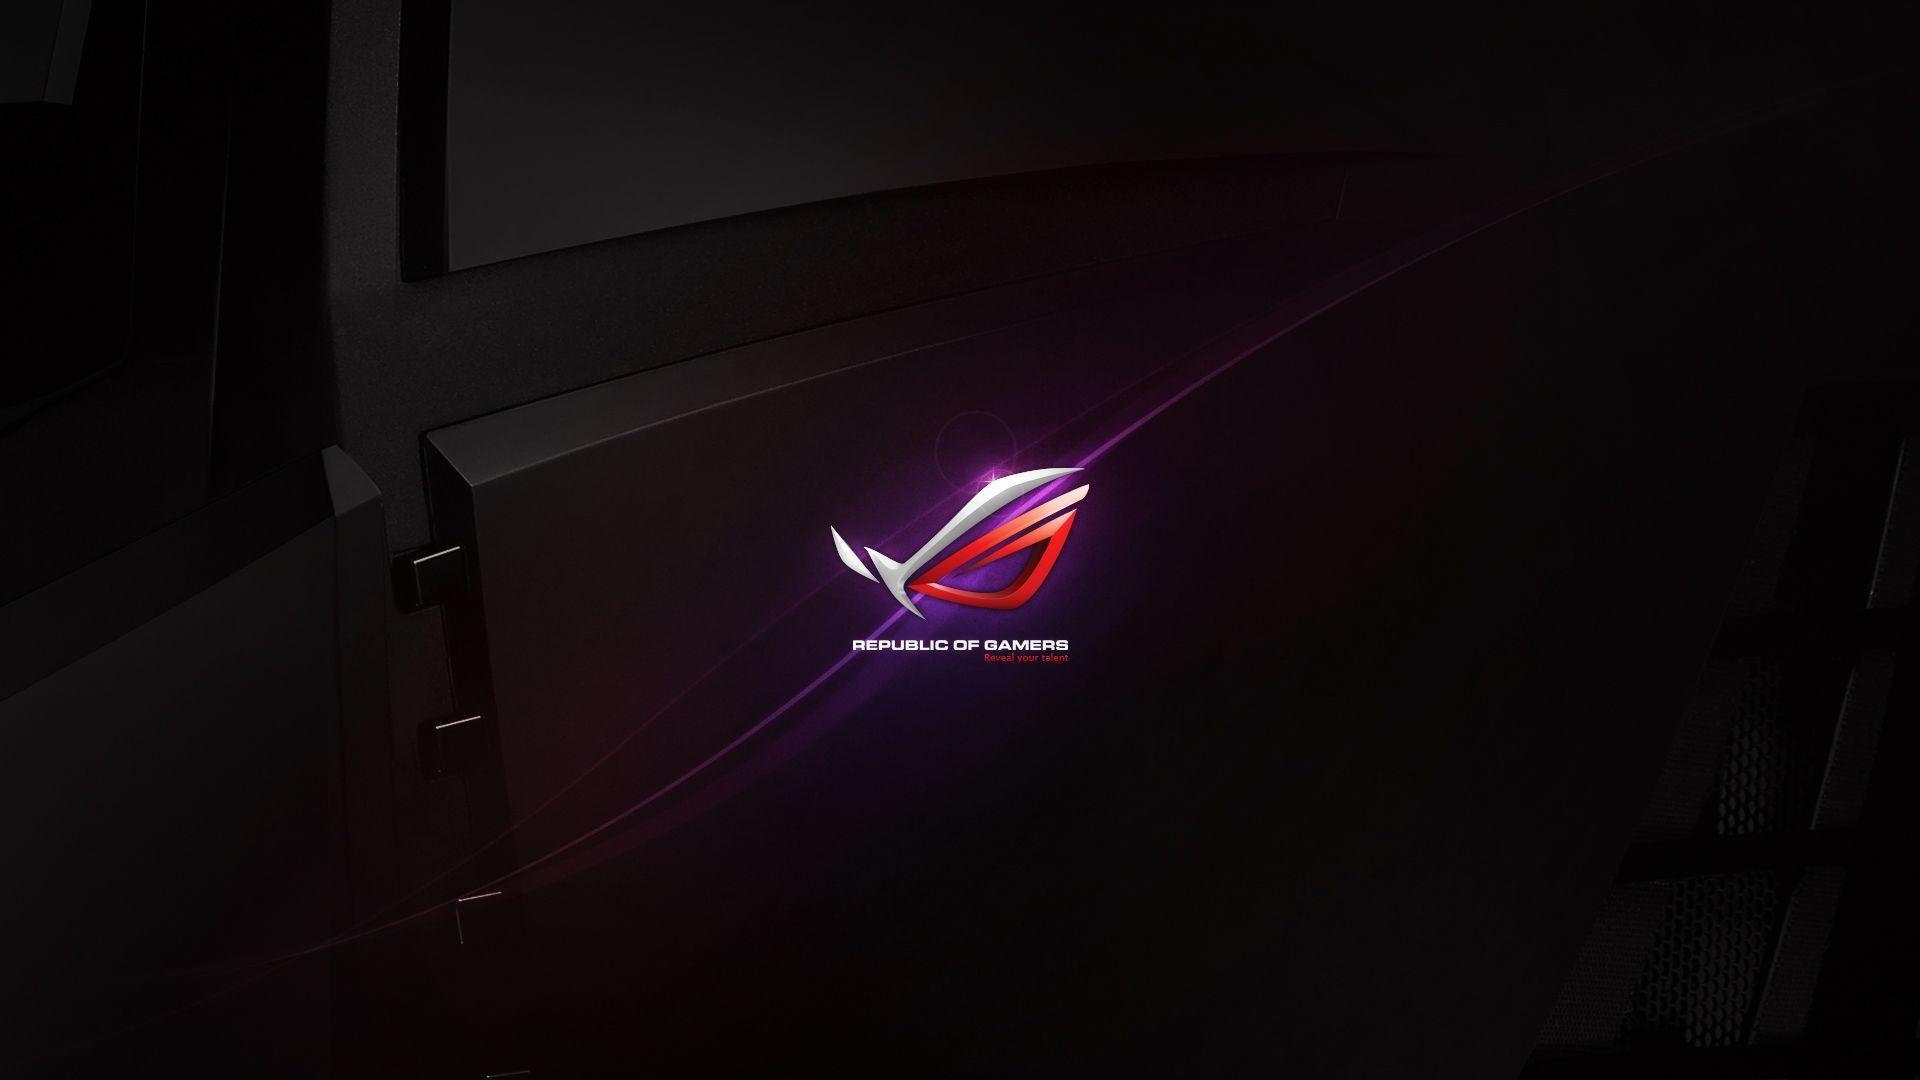 Rog Neon Logo 5k Hd Computer 4k Wallpapers Images: Asus Republic Of Gamers Wallpapers